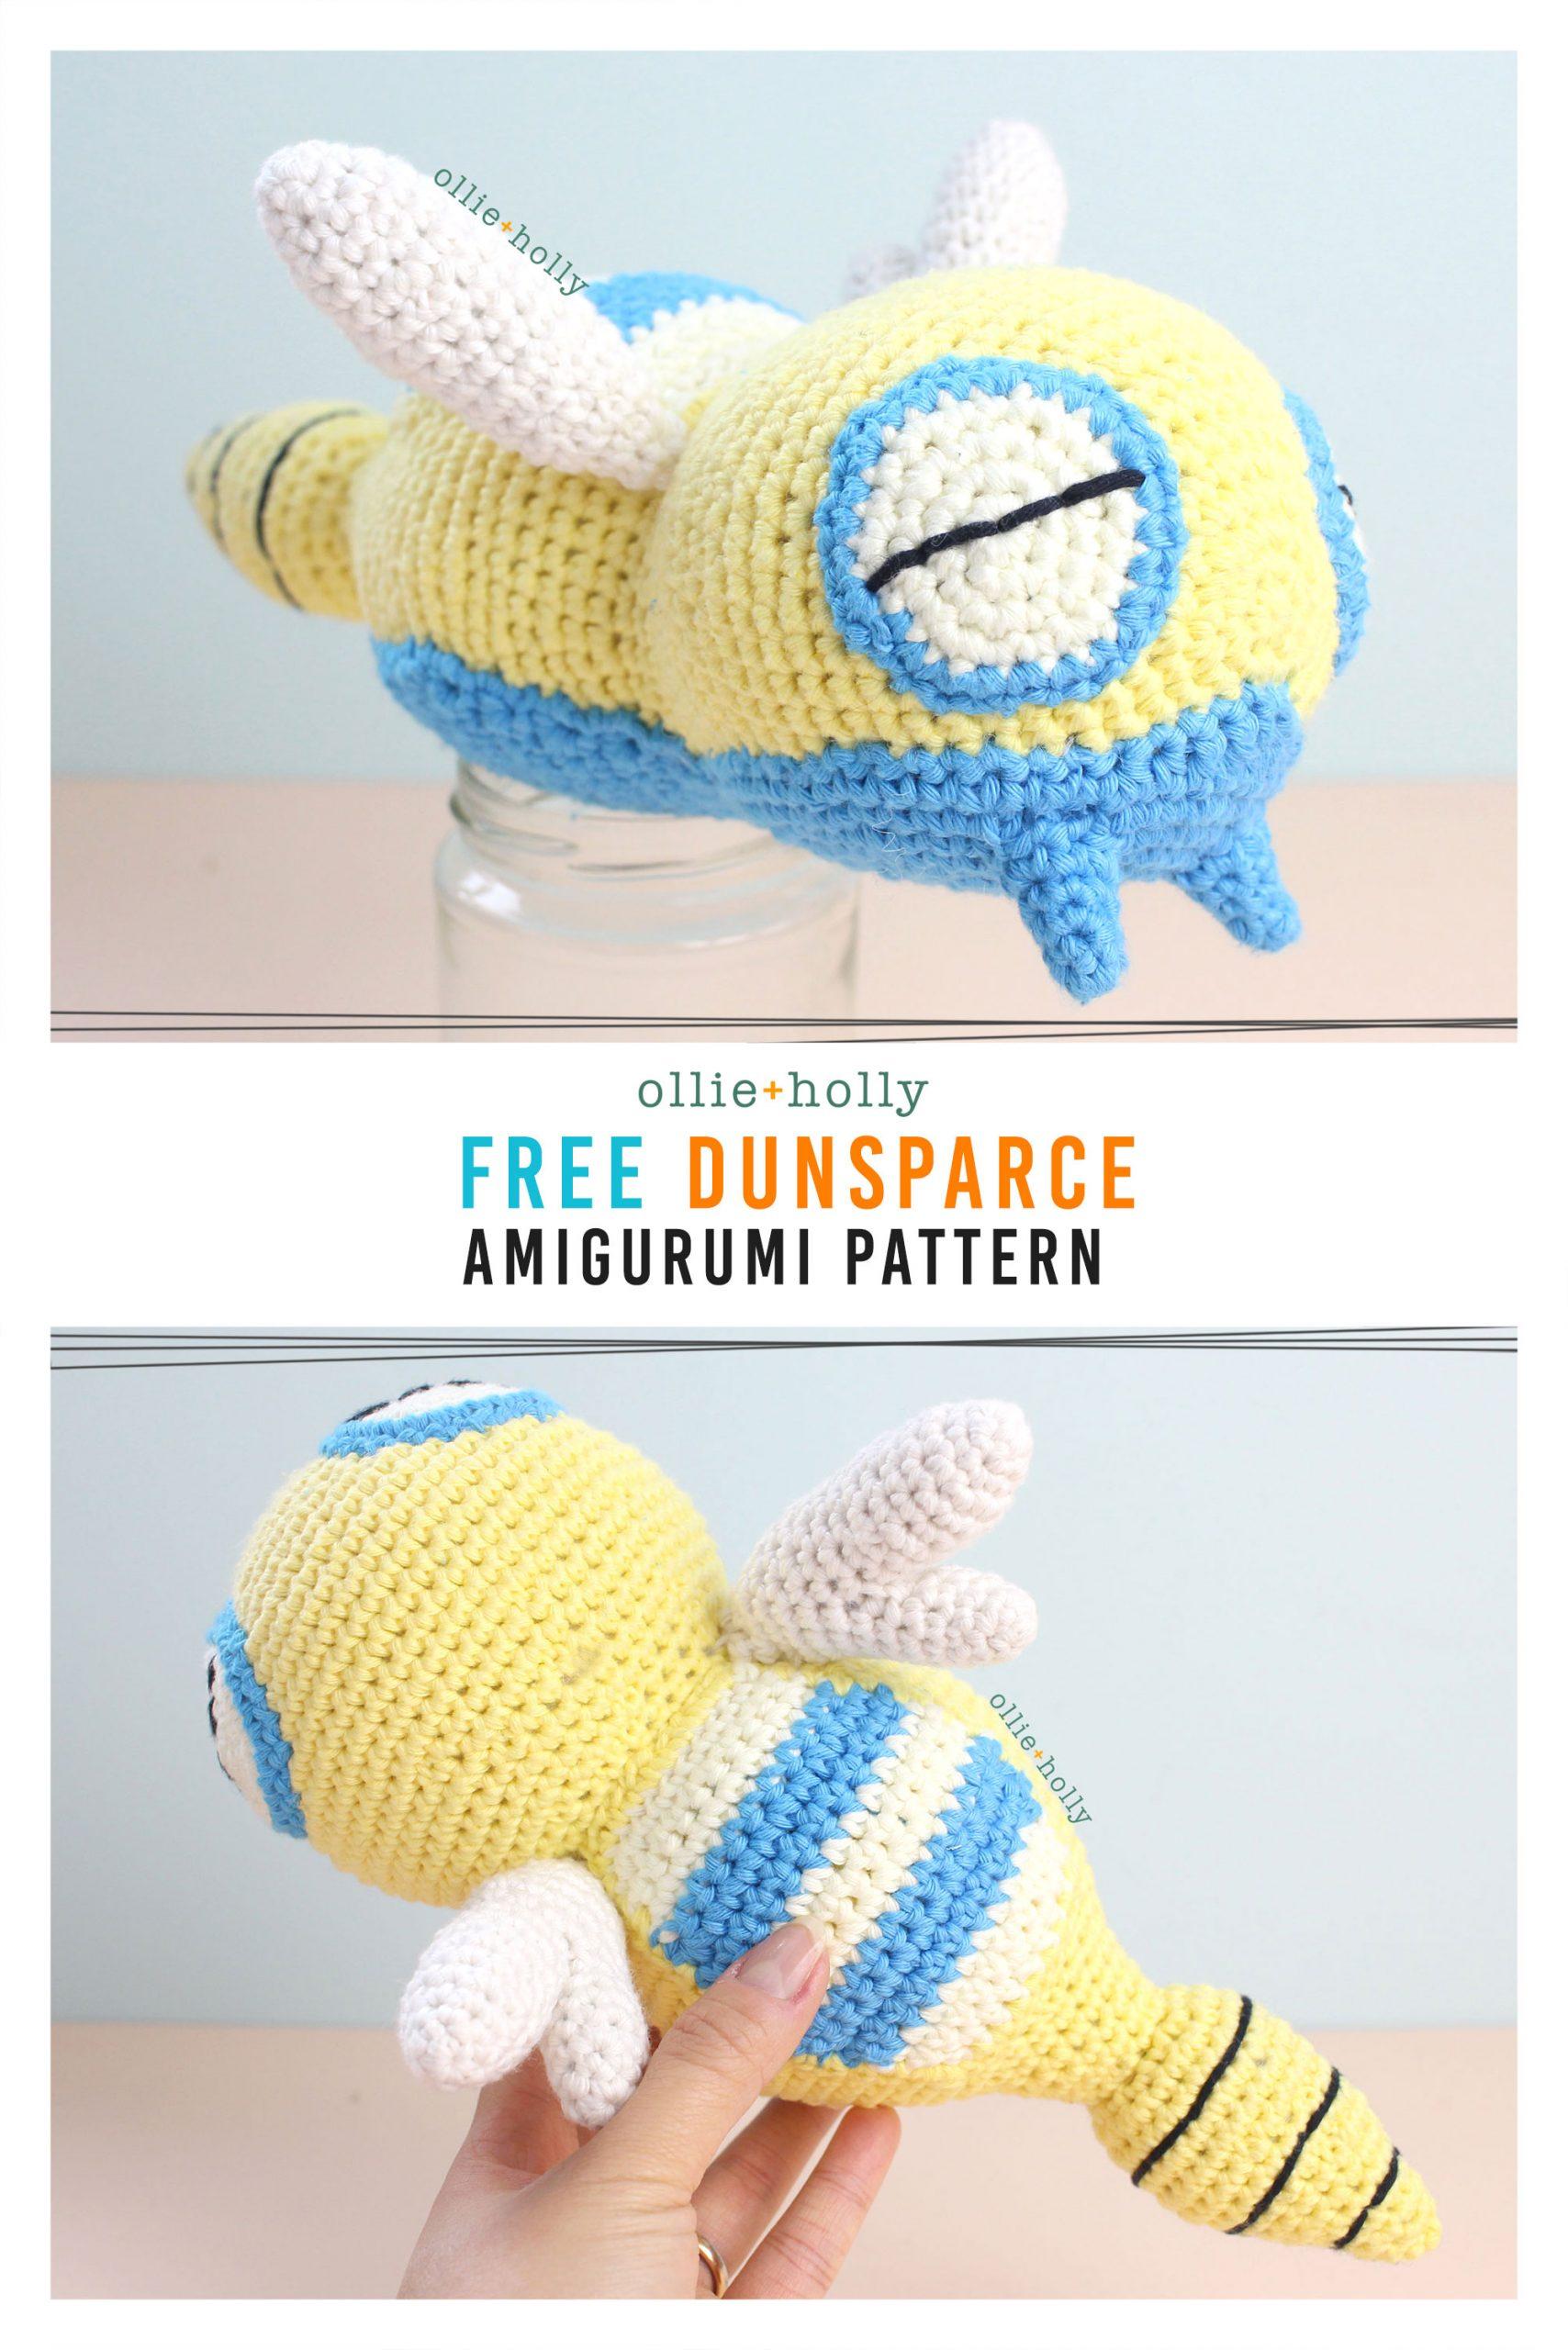 Free Dunsparce Pokemon Amigurumi Crochet Pattern